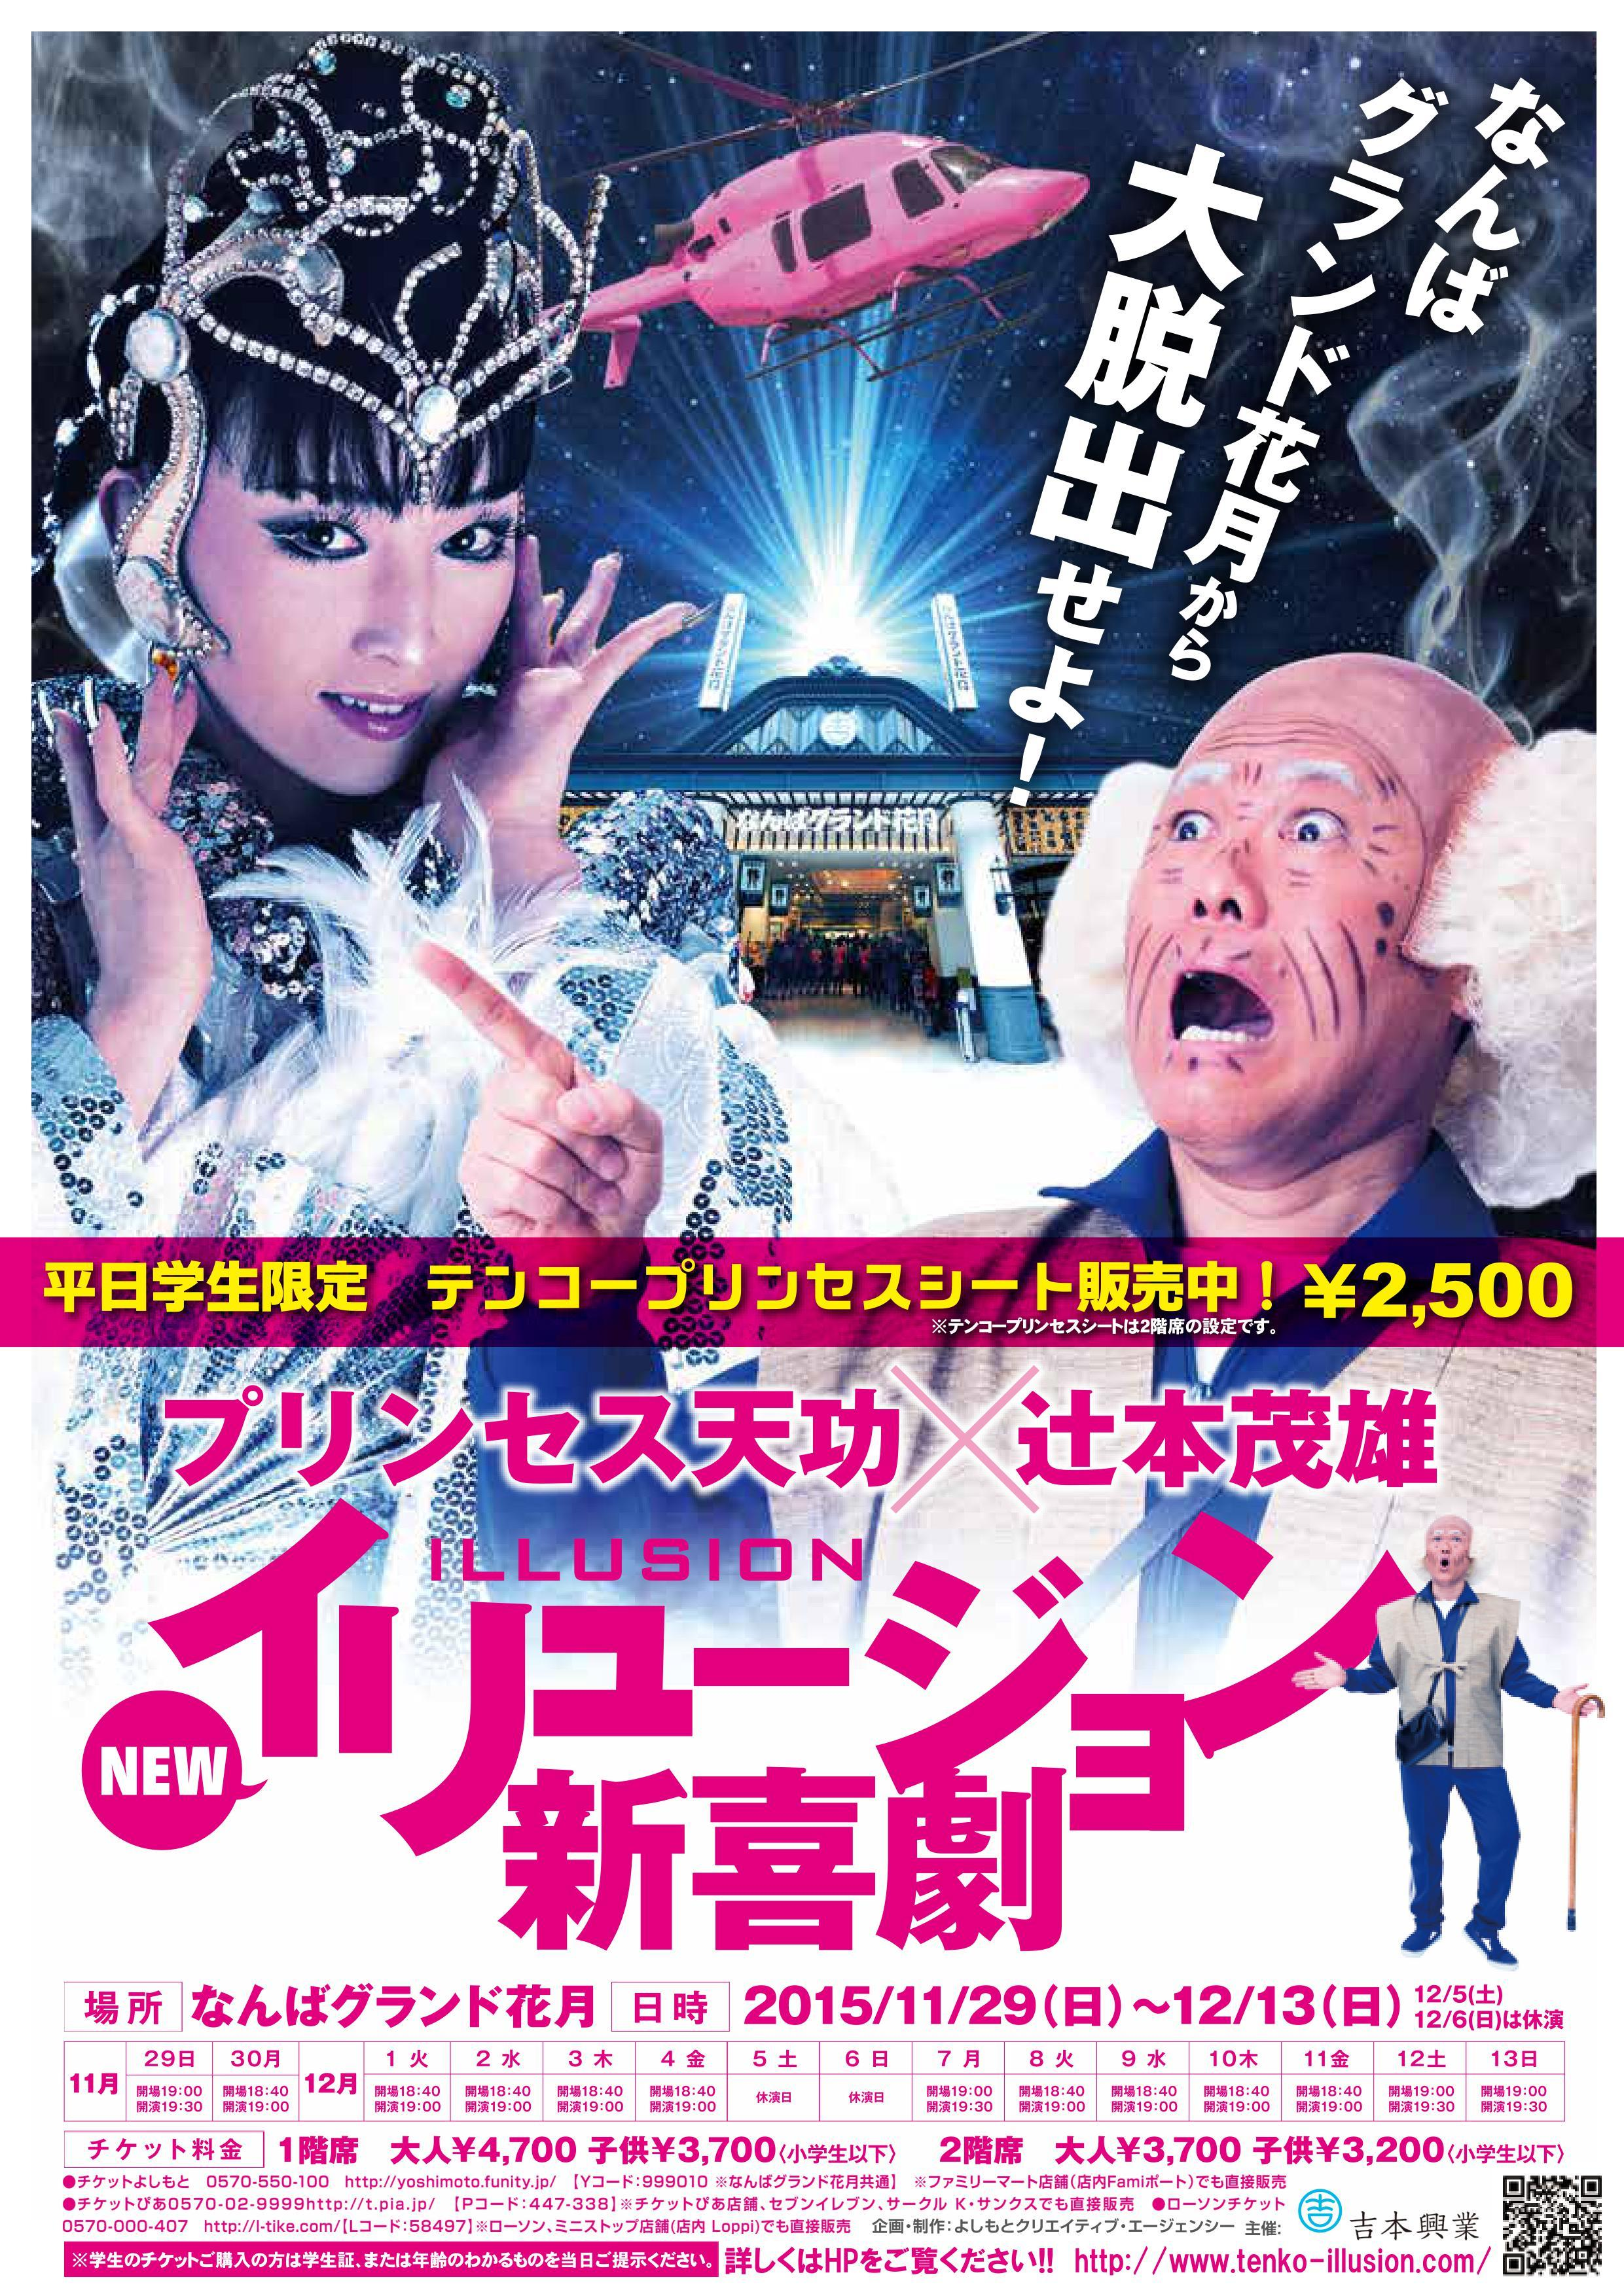 http://news.yoshimoto.co.jp/20151208163117-c9de5e0b0f57d20a40b042e6bebbfc8d37ac6a2f.jpg